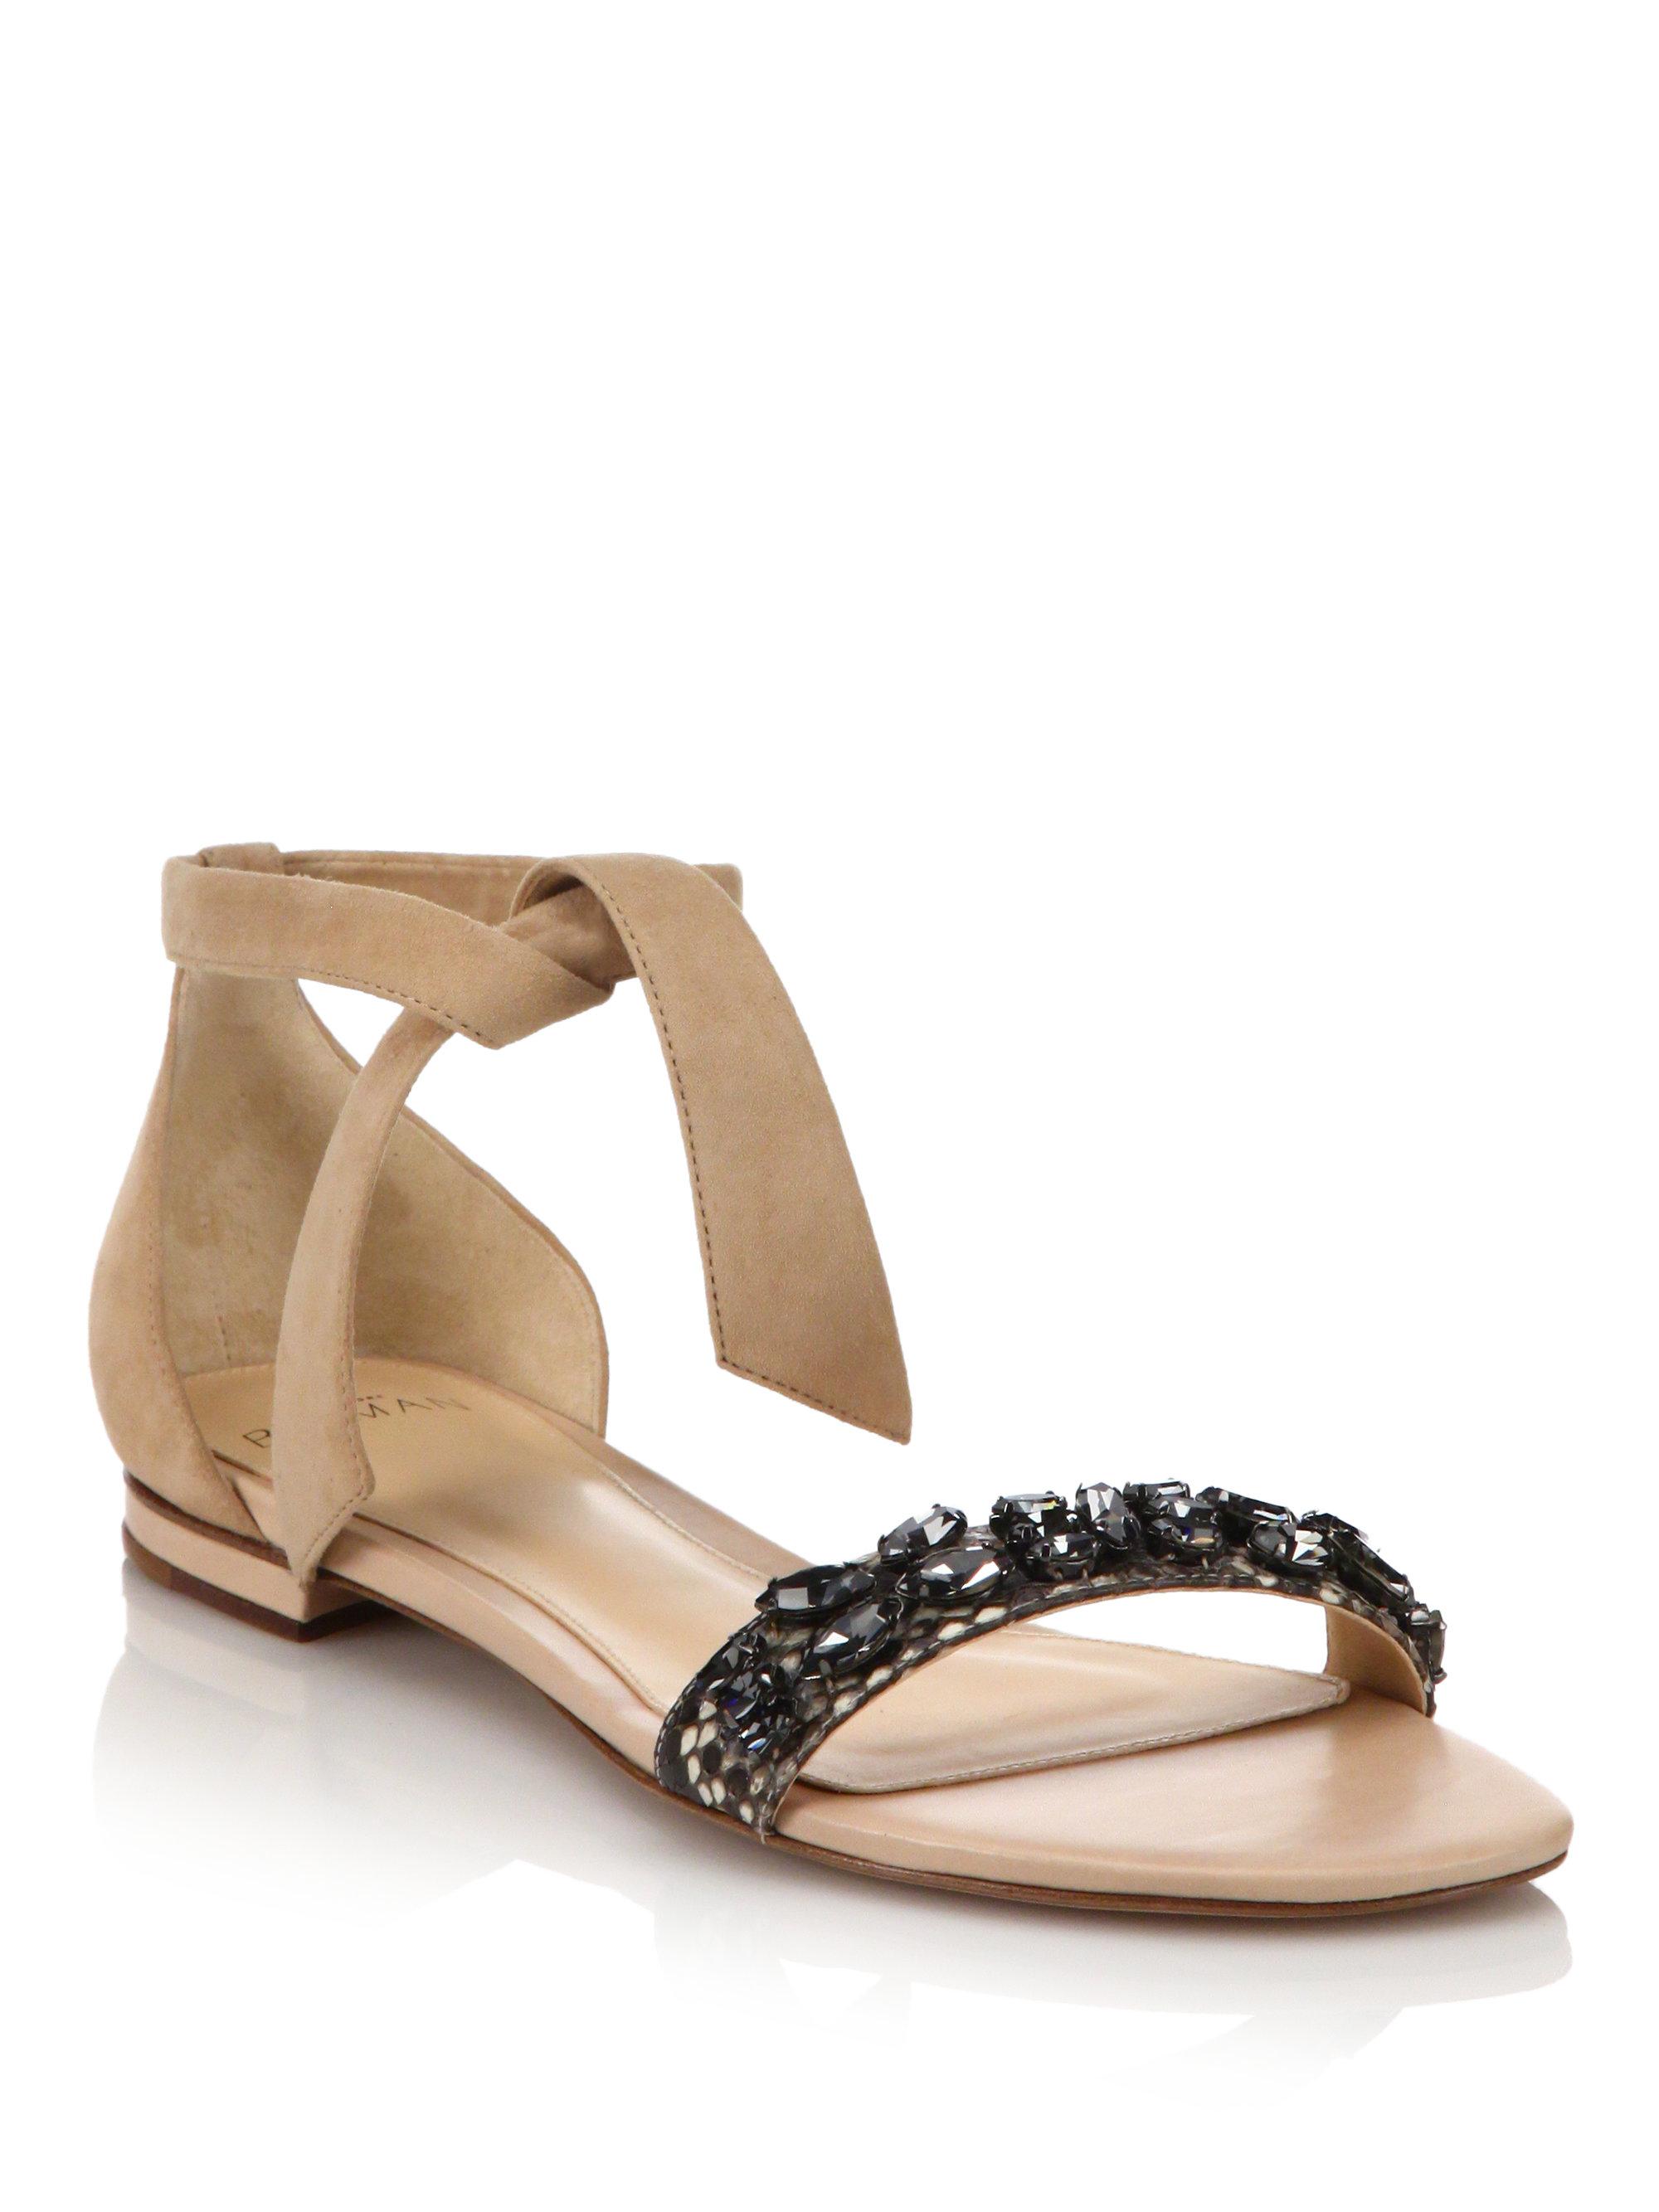 Alexandre Birman Clarita Jeweled Suede U0026 Python Flat Sandals In Black | Lyst